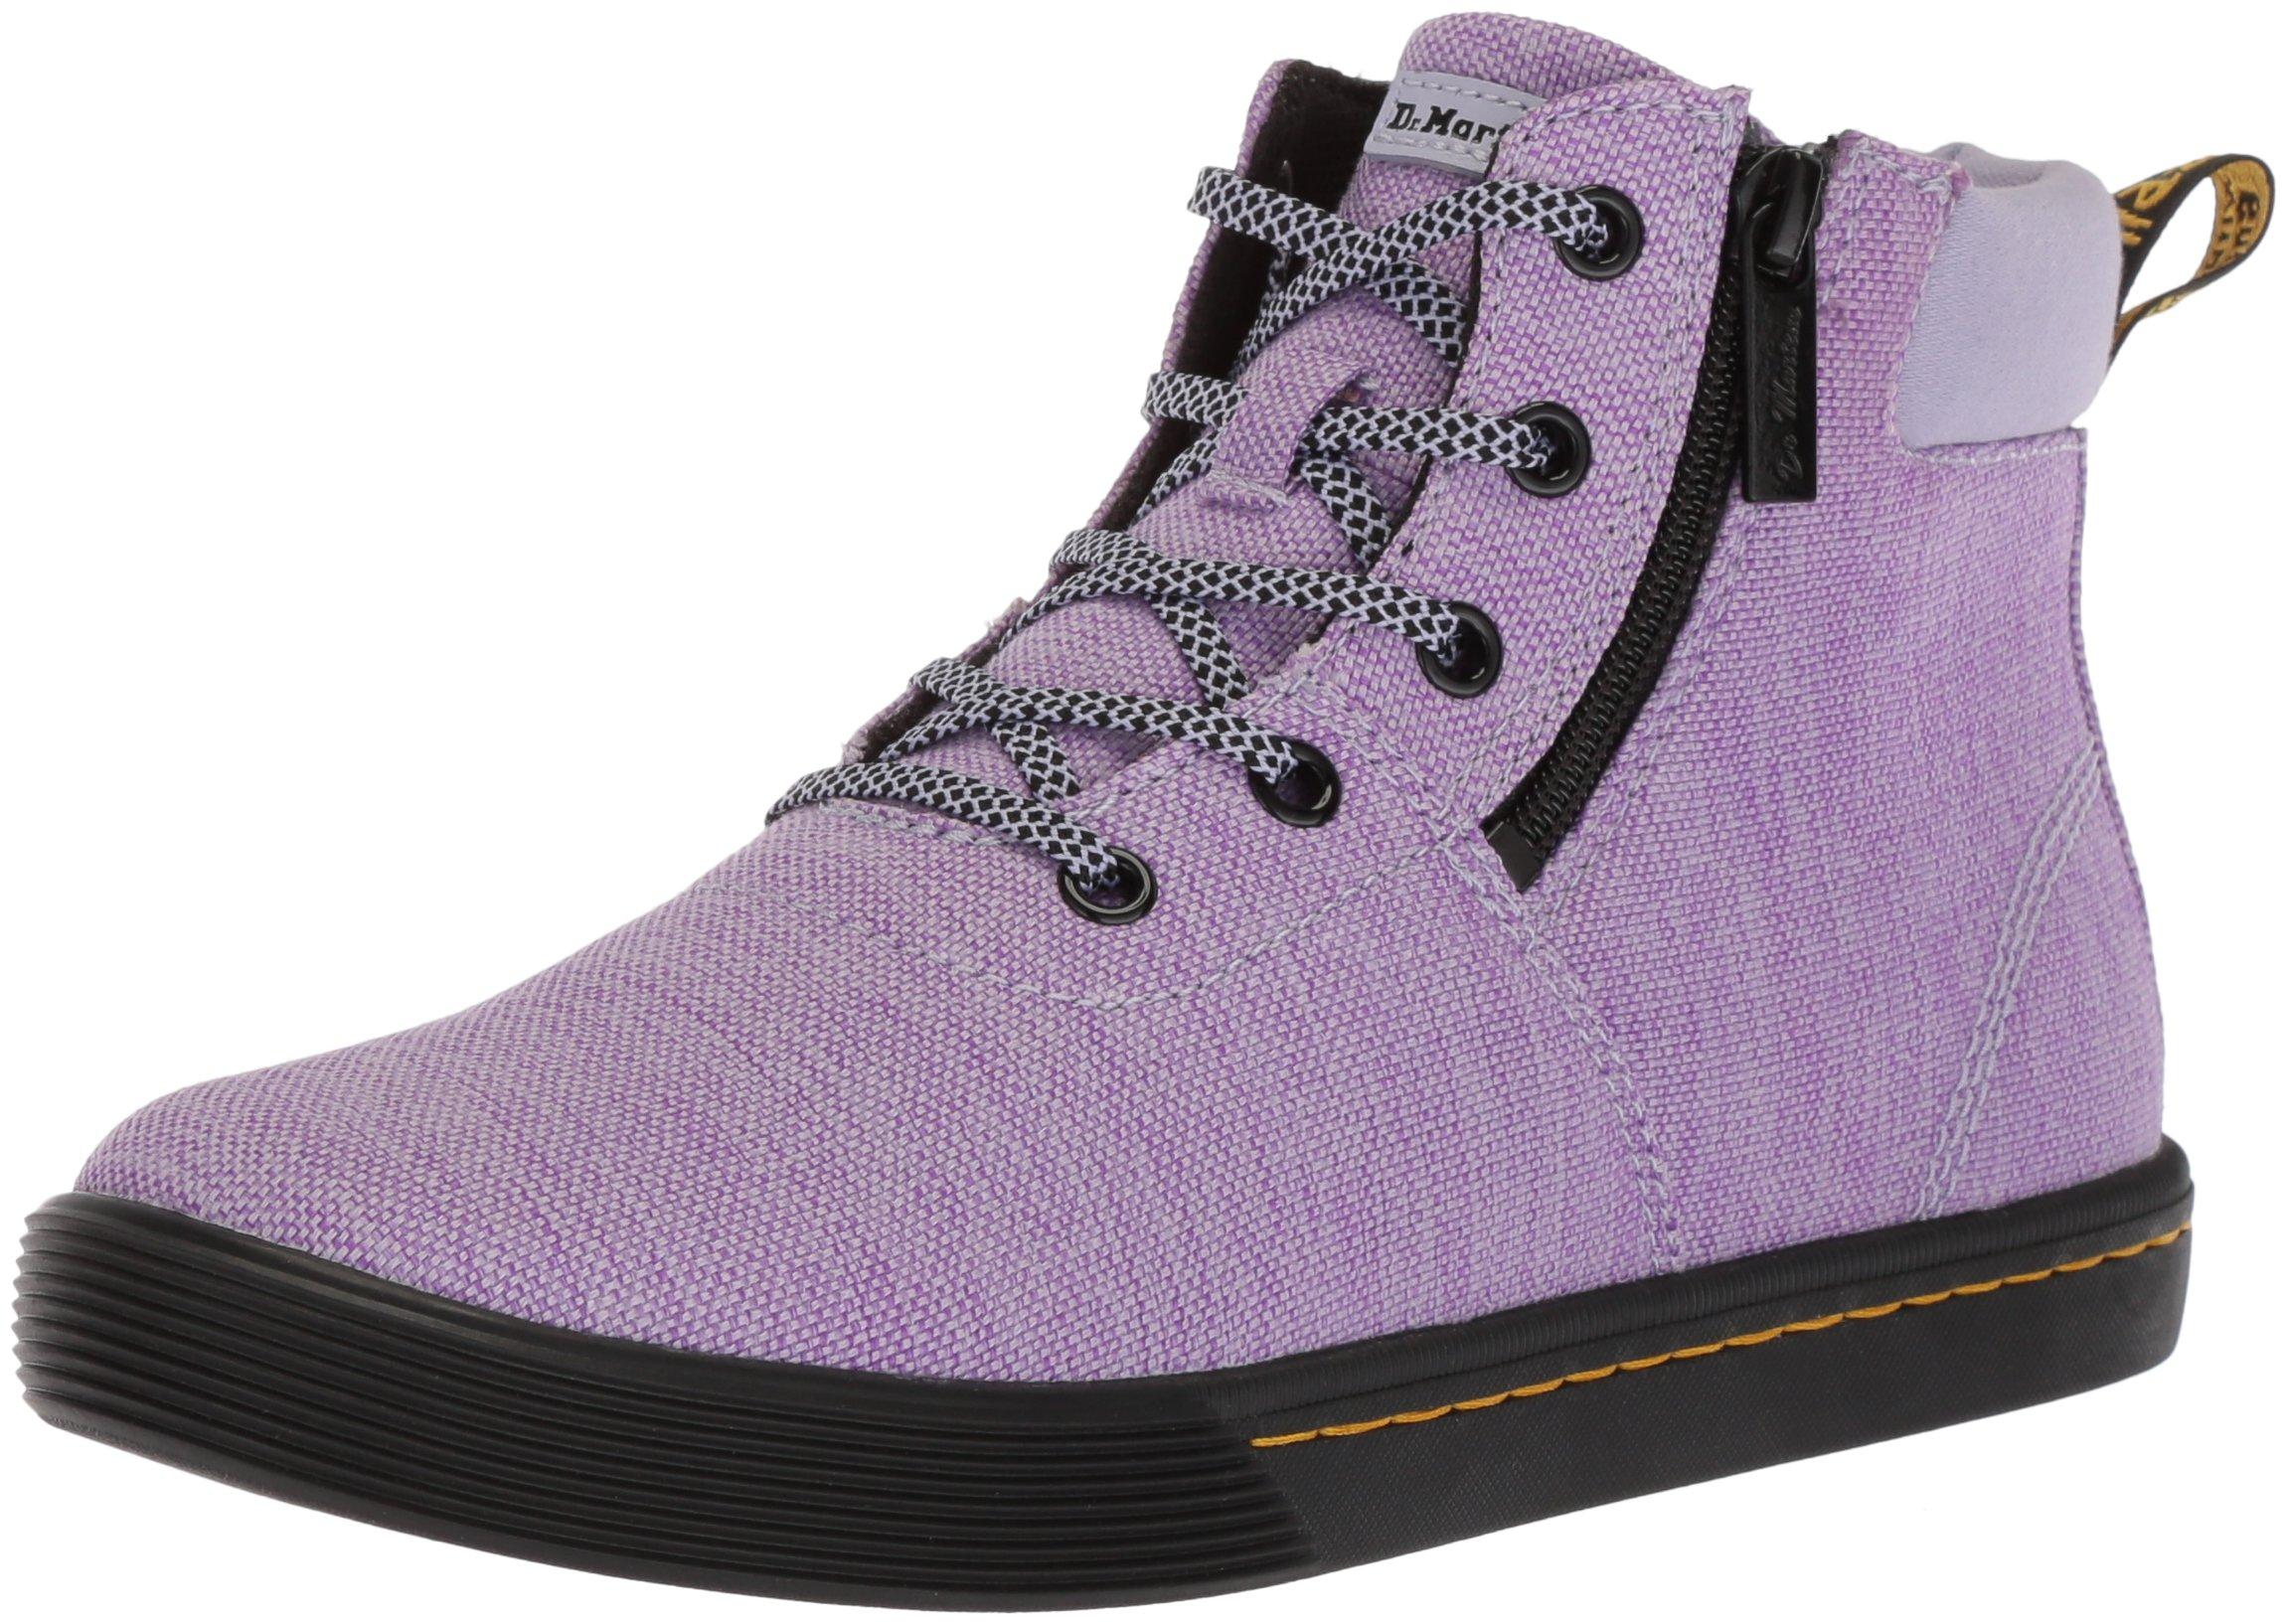 Dr. Martens Women's Maegley Fashion Boot, Purple Heather Woven Textile+Fine Canvas, 6 Medium UK (8 US)